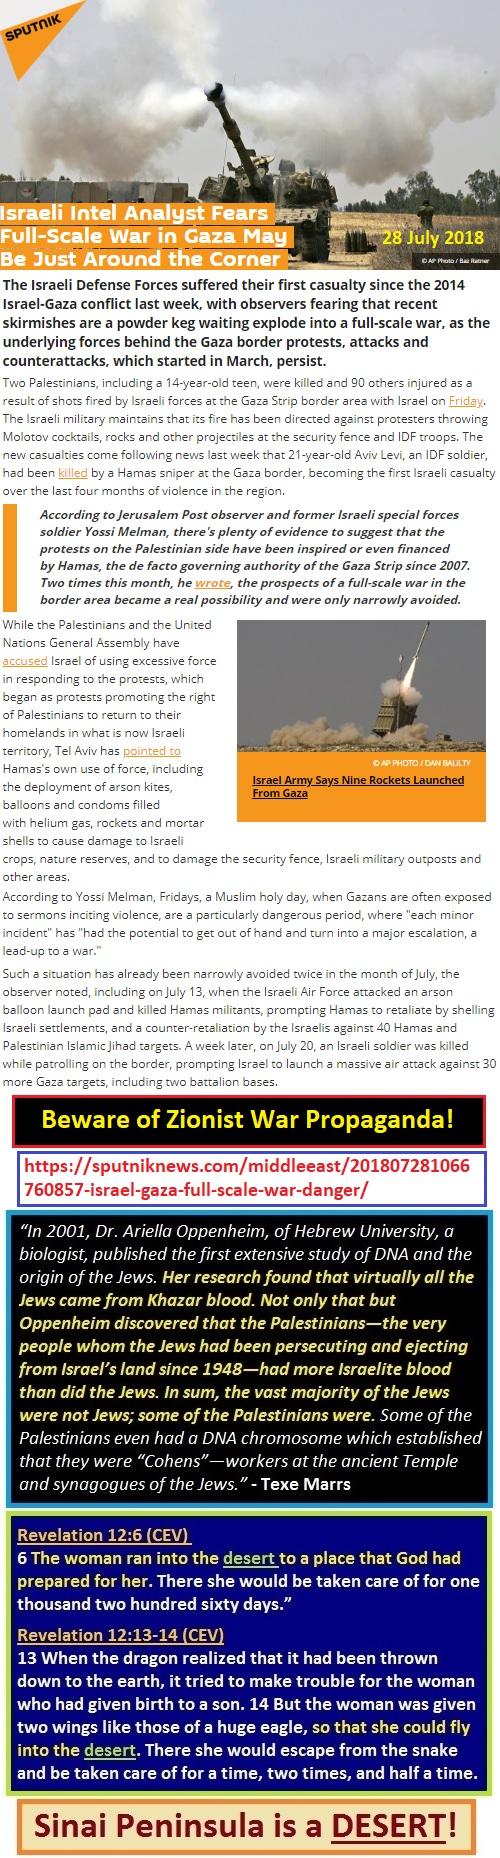 https://sputniknews.com/middleeast/201807281066760857-israel-gaza-full-scale-war-danger/